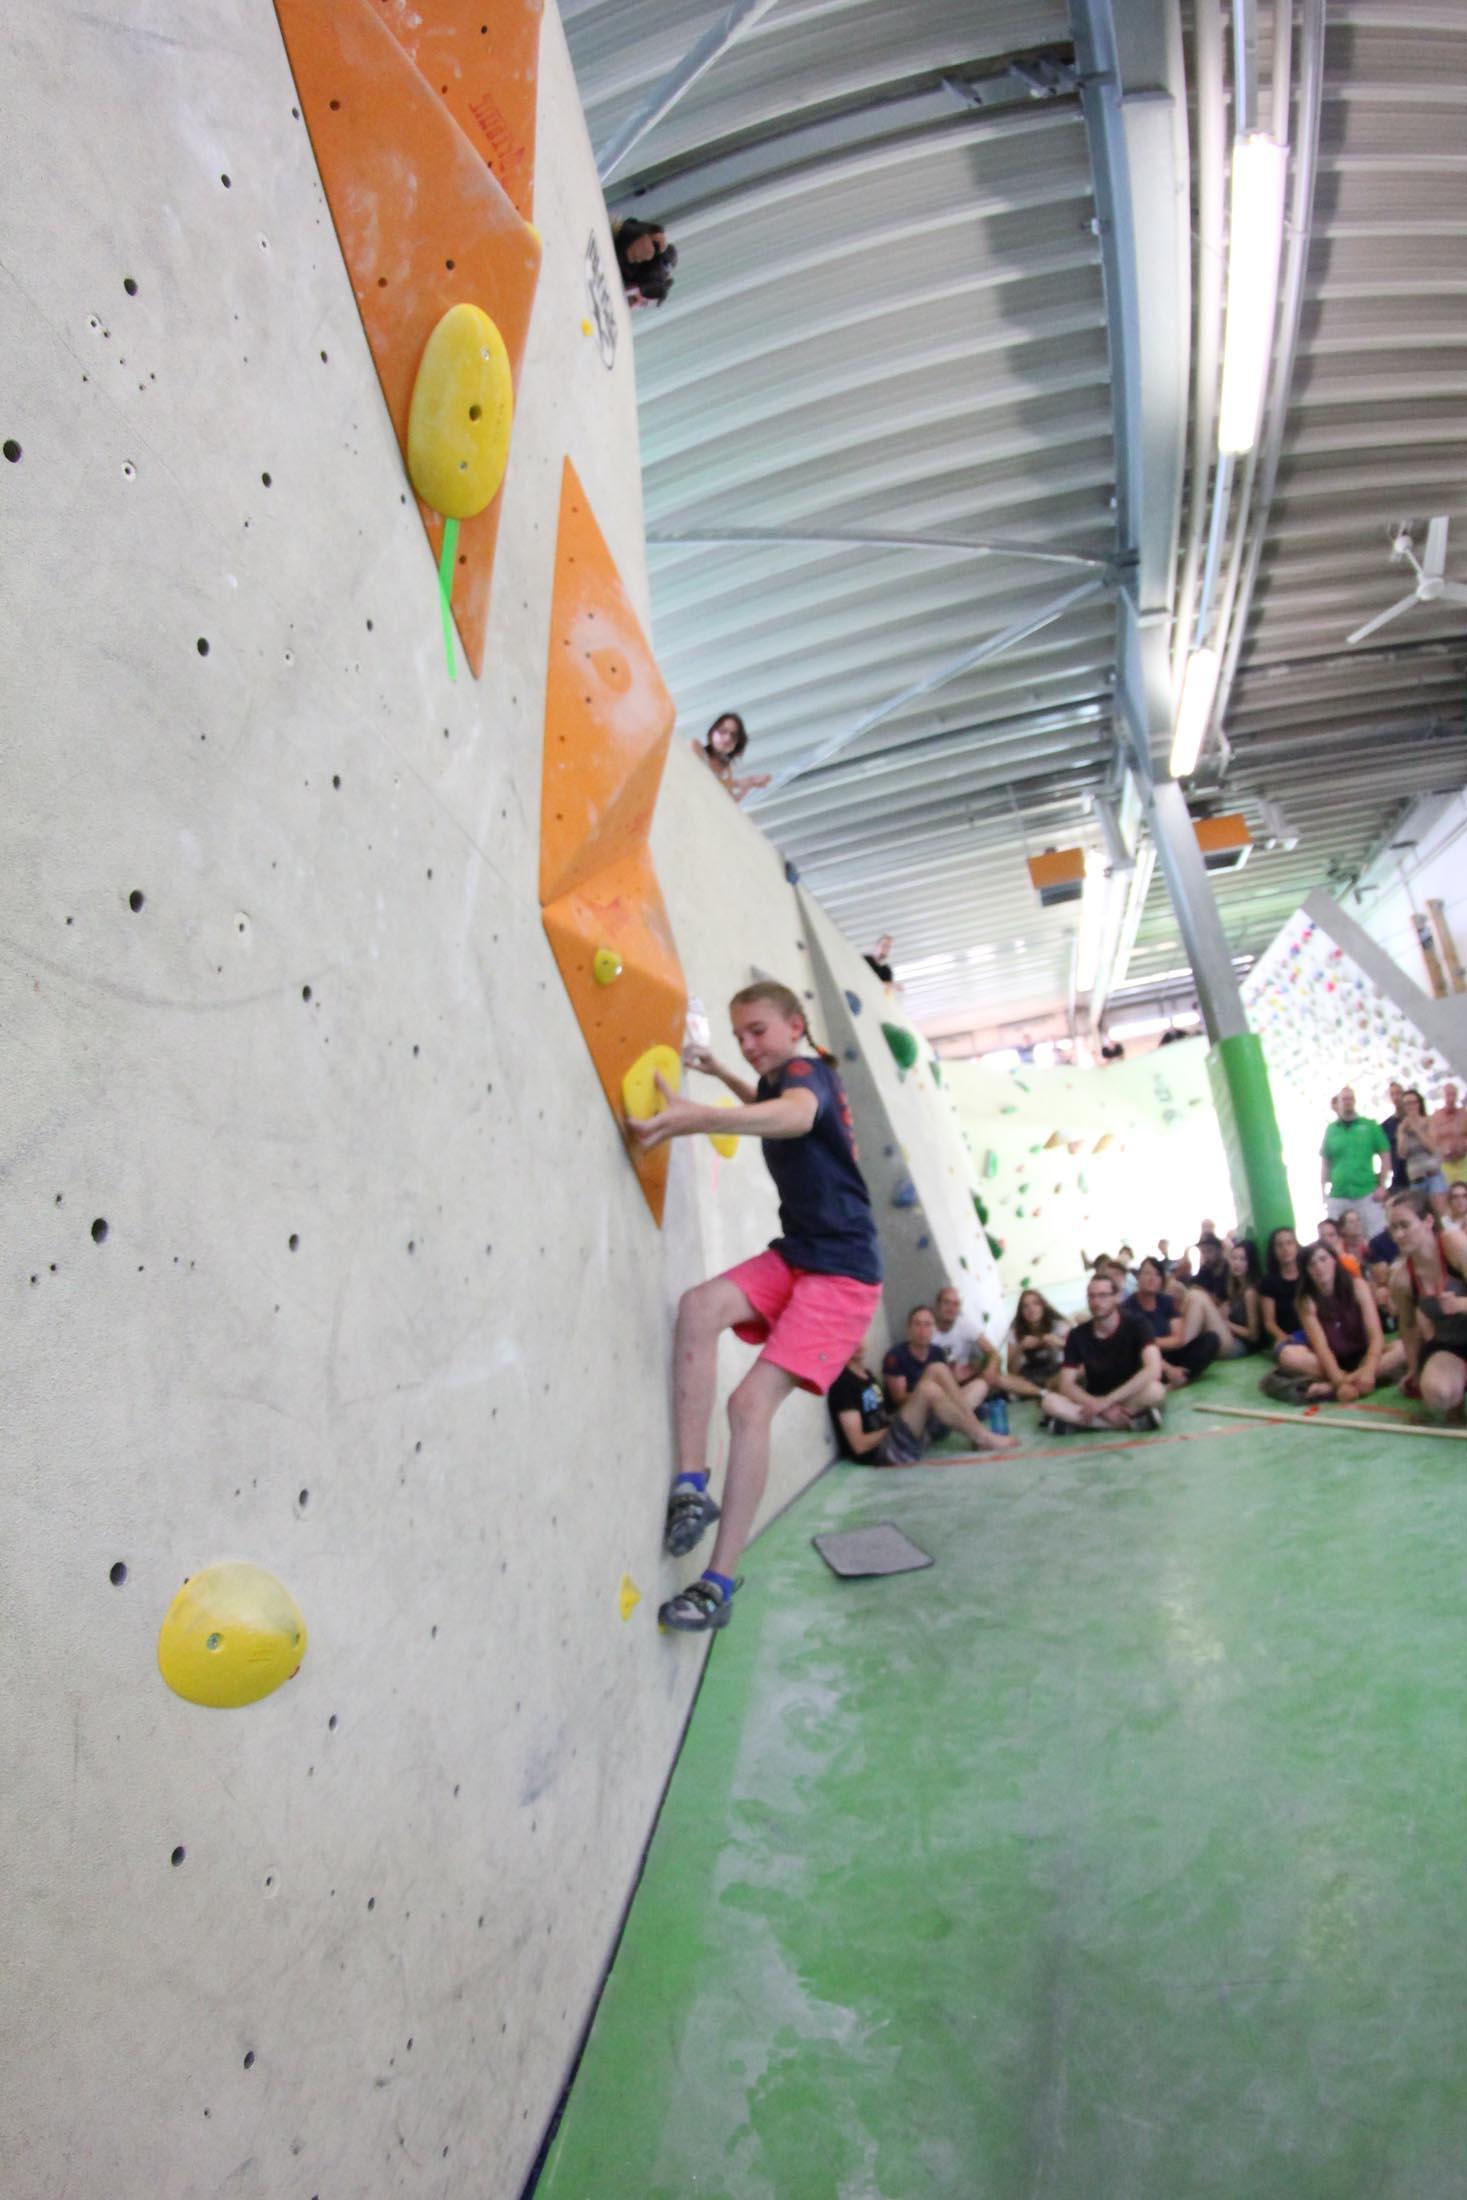 Finale, internationaler bouldercup Frankenjura 2016, BLOCKHELDEN Erlangen, Mammut, Bergfreunde.de, Boulderwettkampf07092016533